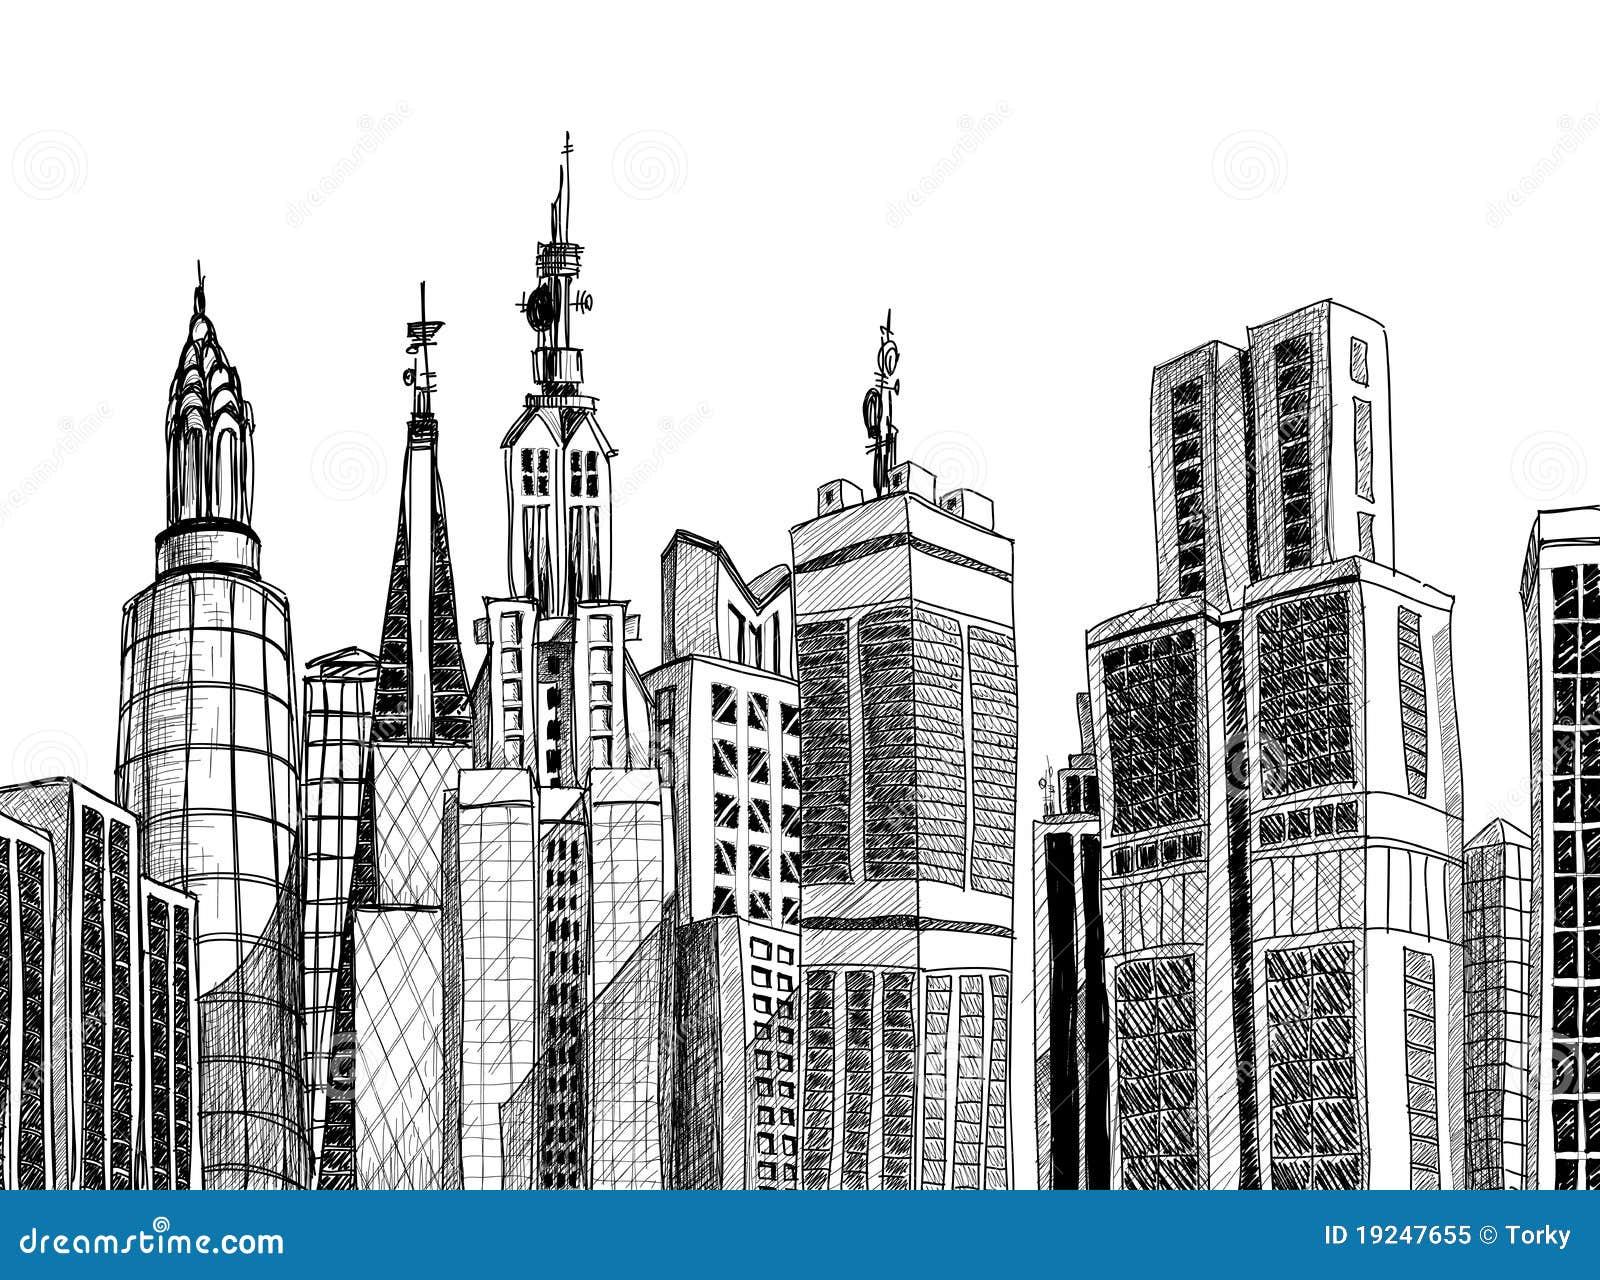 Urban Generic Architecture Sketch Stock Vector ...